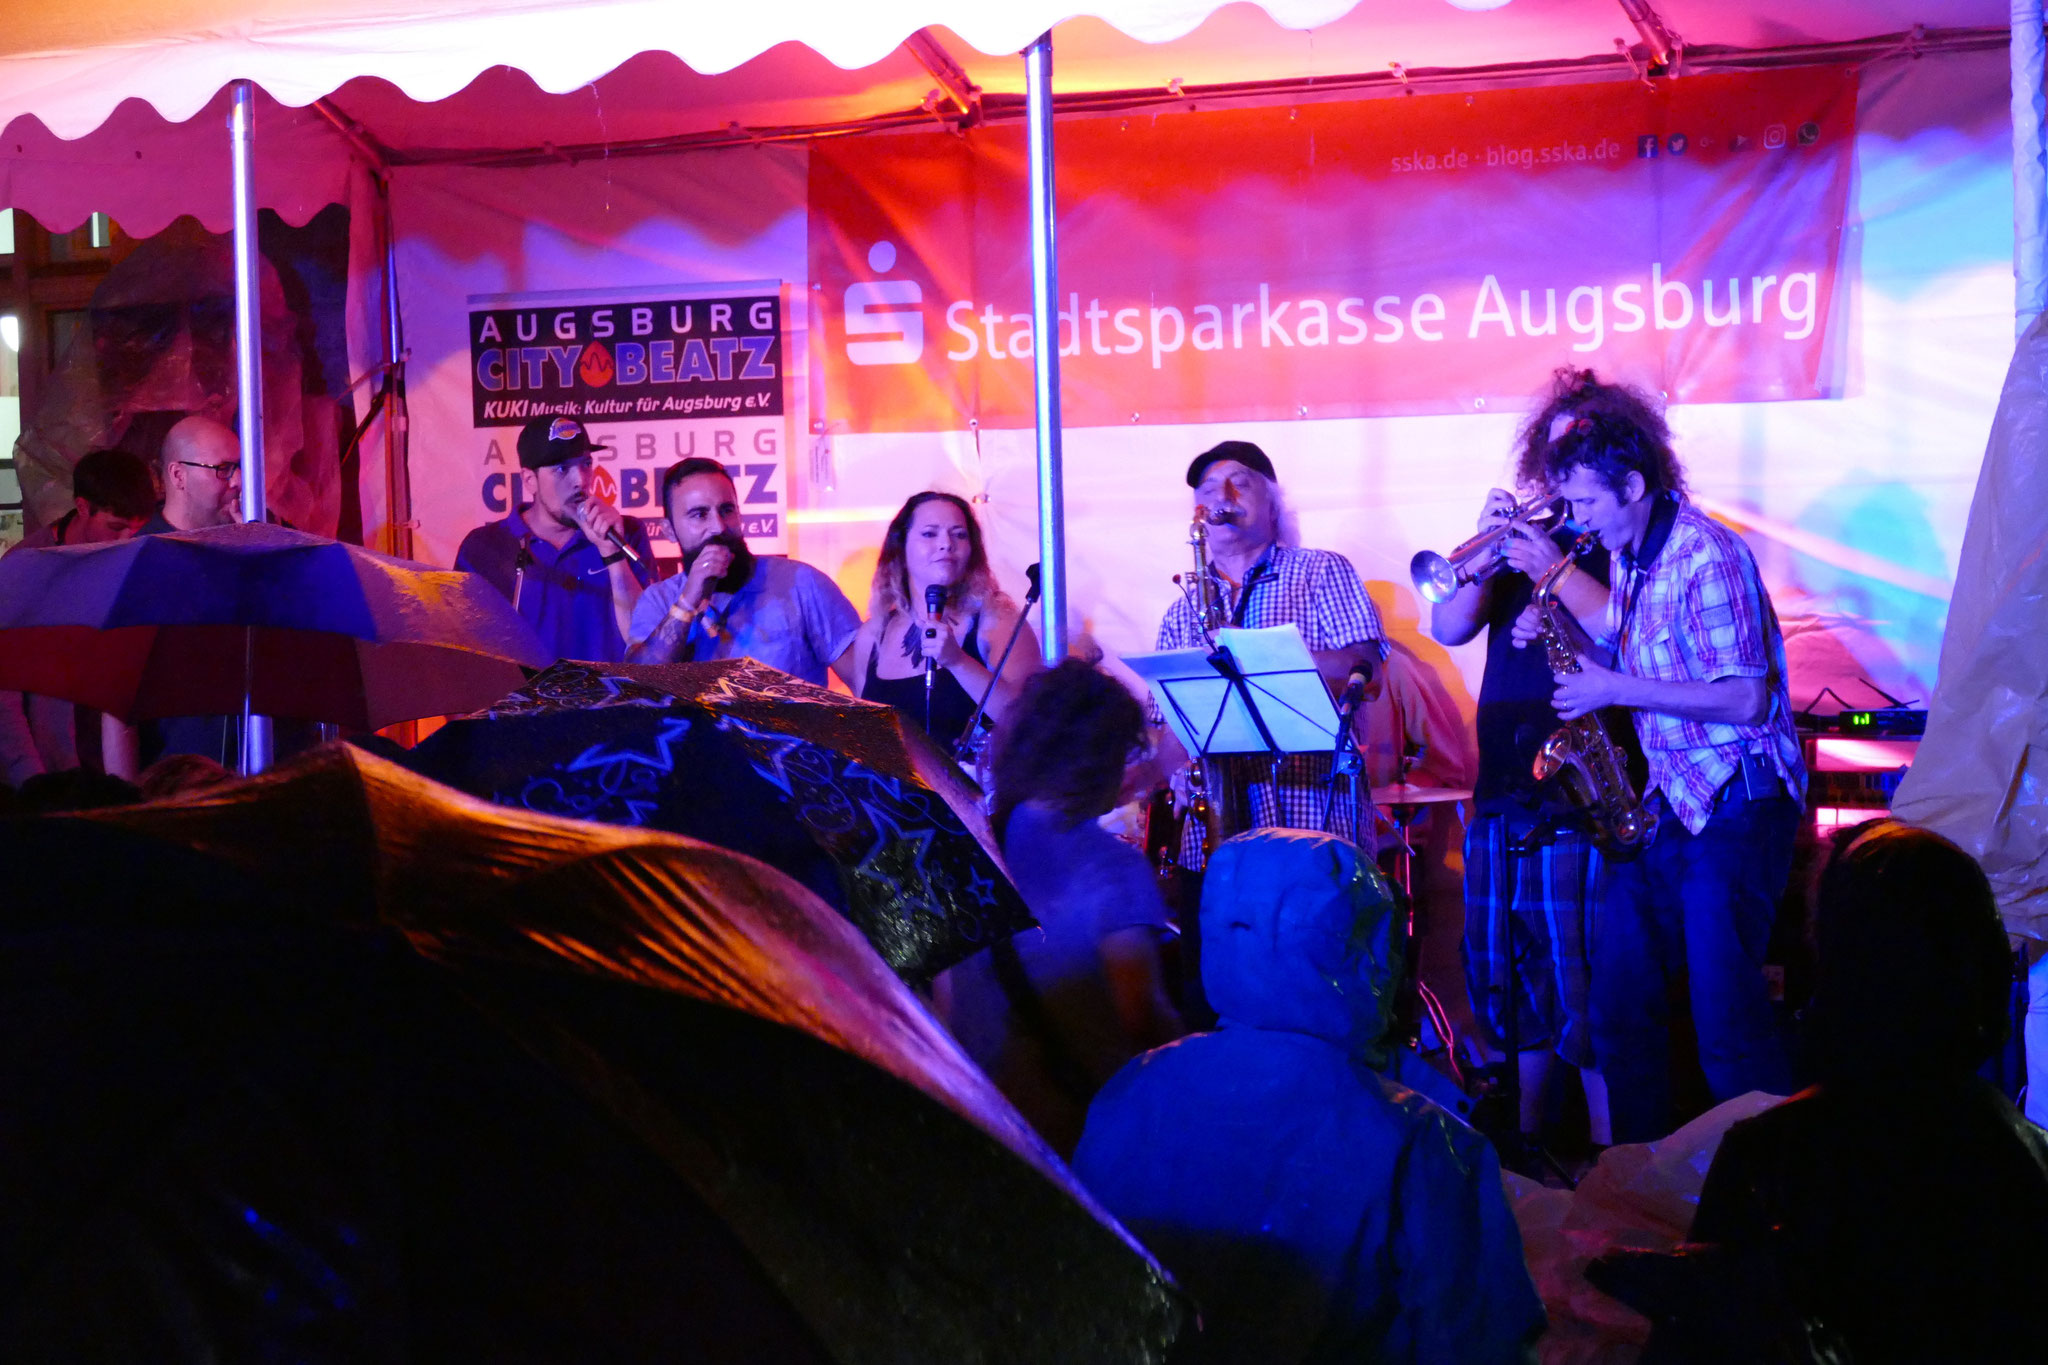 Konzerte im Bürgerhof 07.07.17 Motherfunkers - Freiwilligen-Zentrum Augsburg - Foto: Christoph Urban